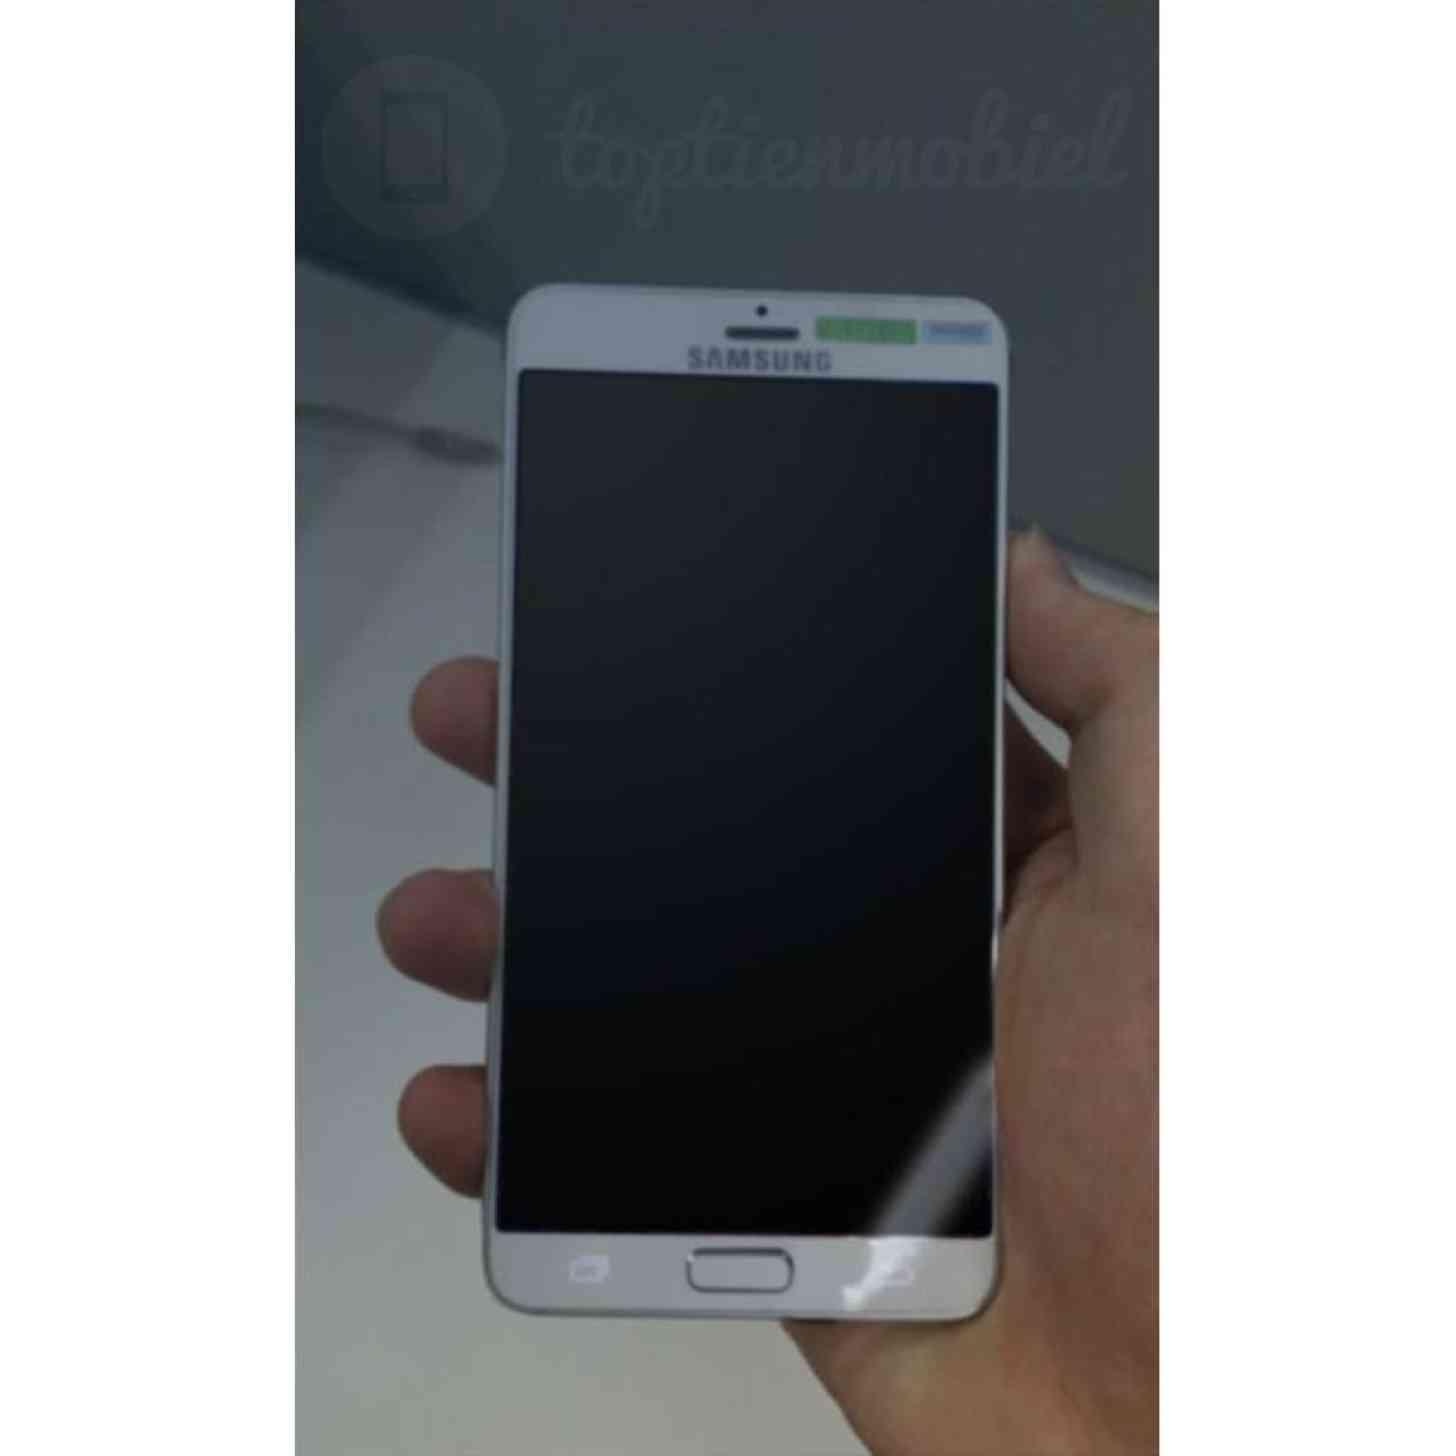 Samsung Galaxy S6 prototype photo leak